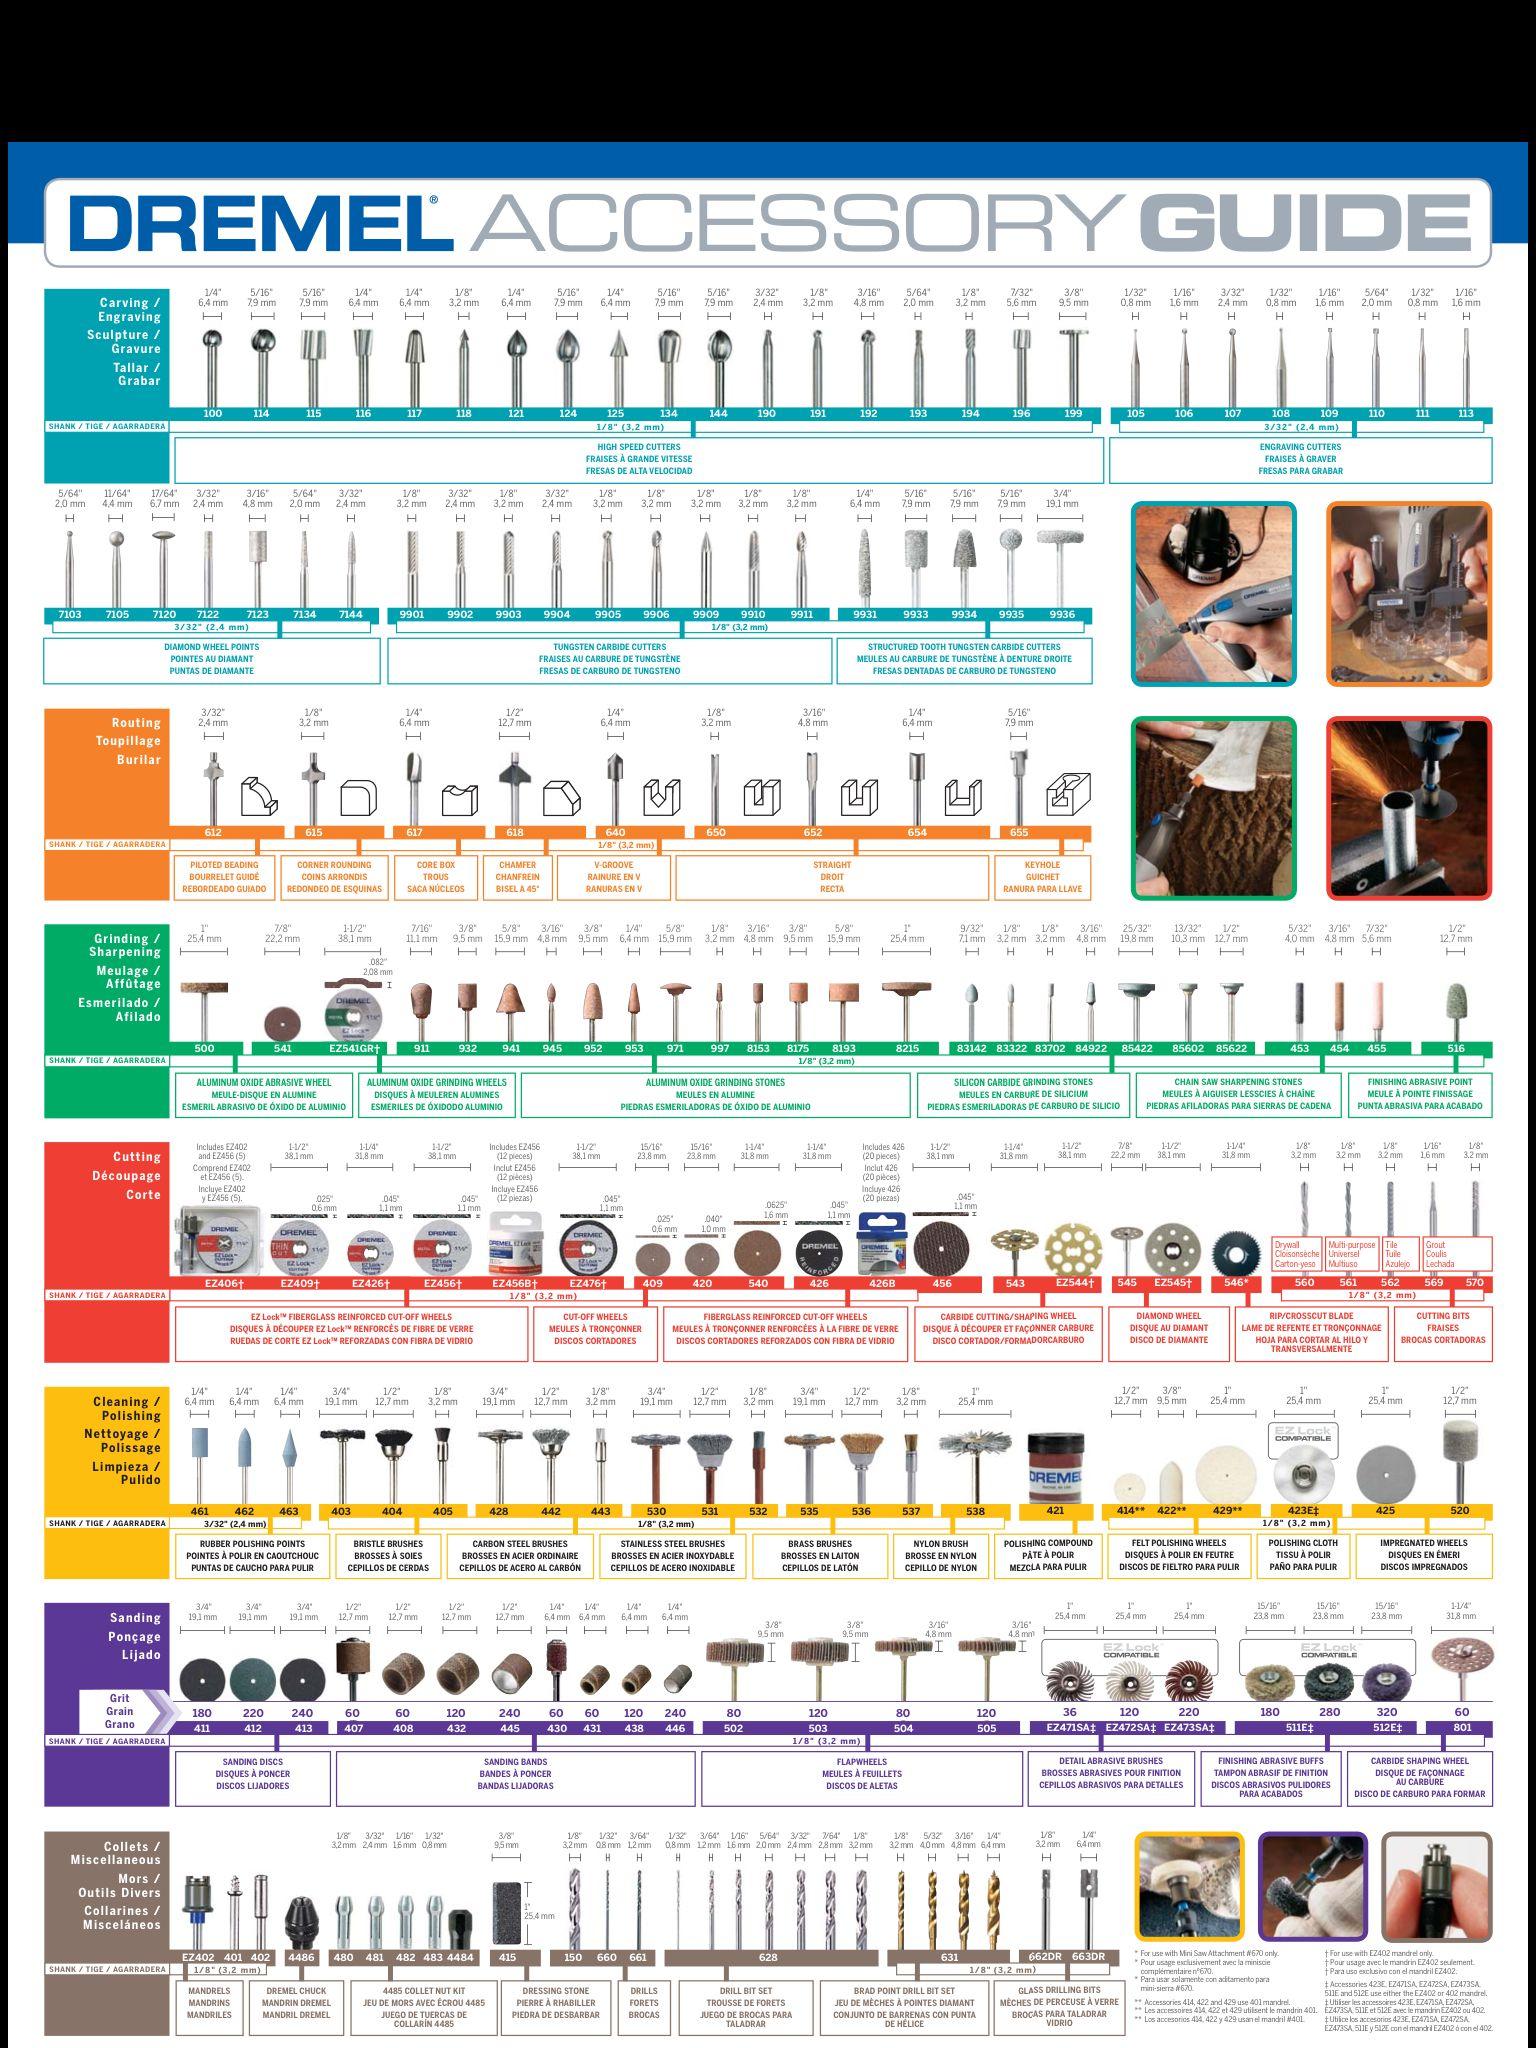 dremel accessory guide diy pinterest dremel accessories, tools End Mill Diagram dremel accessory poster